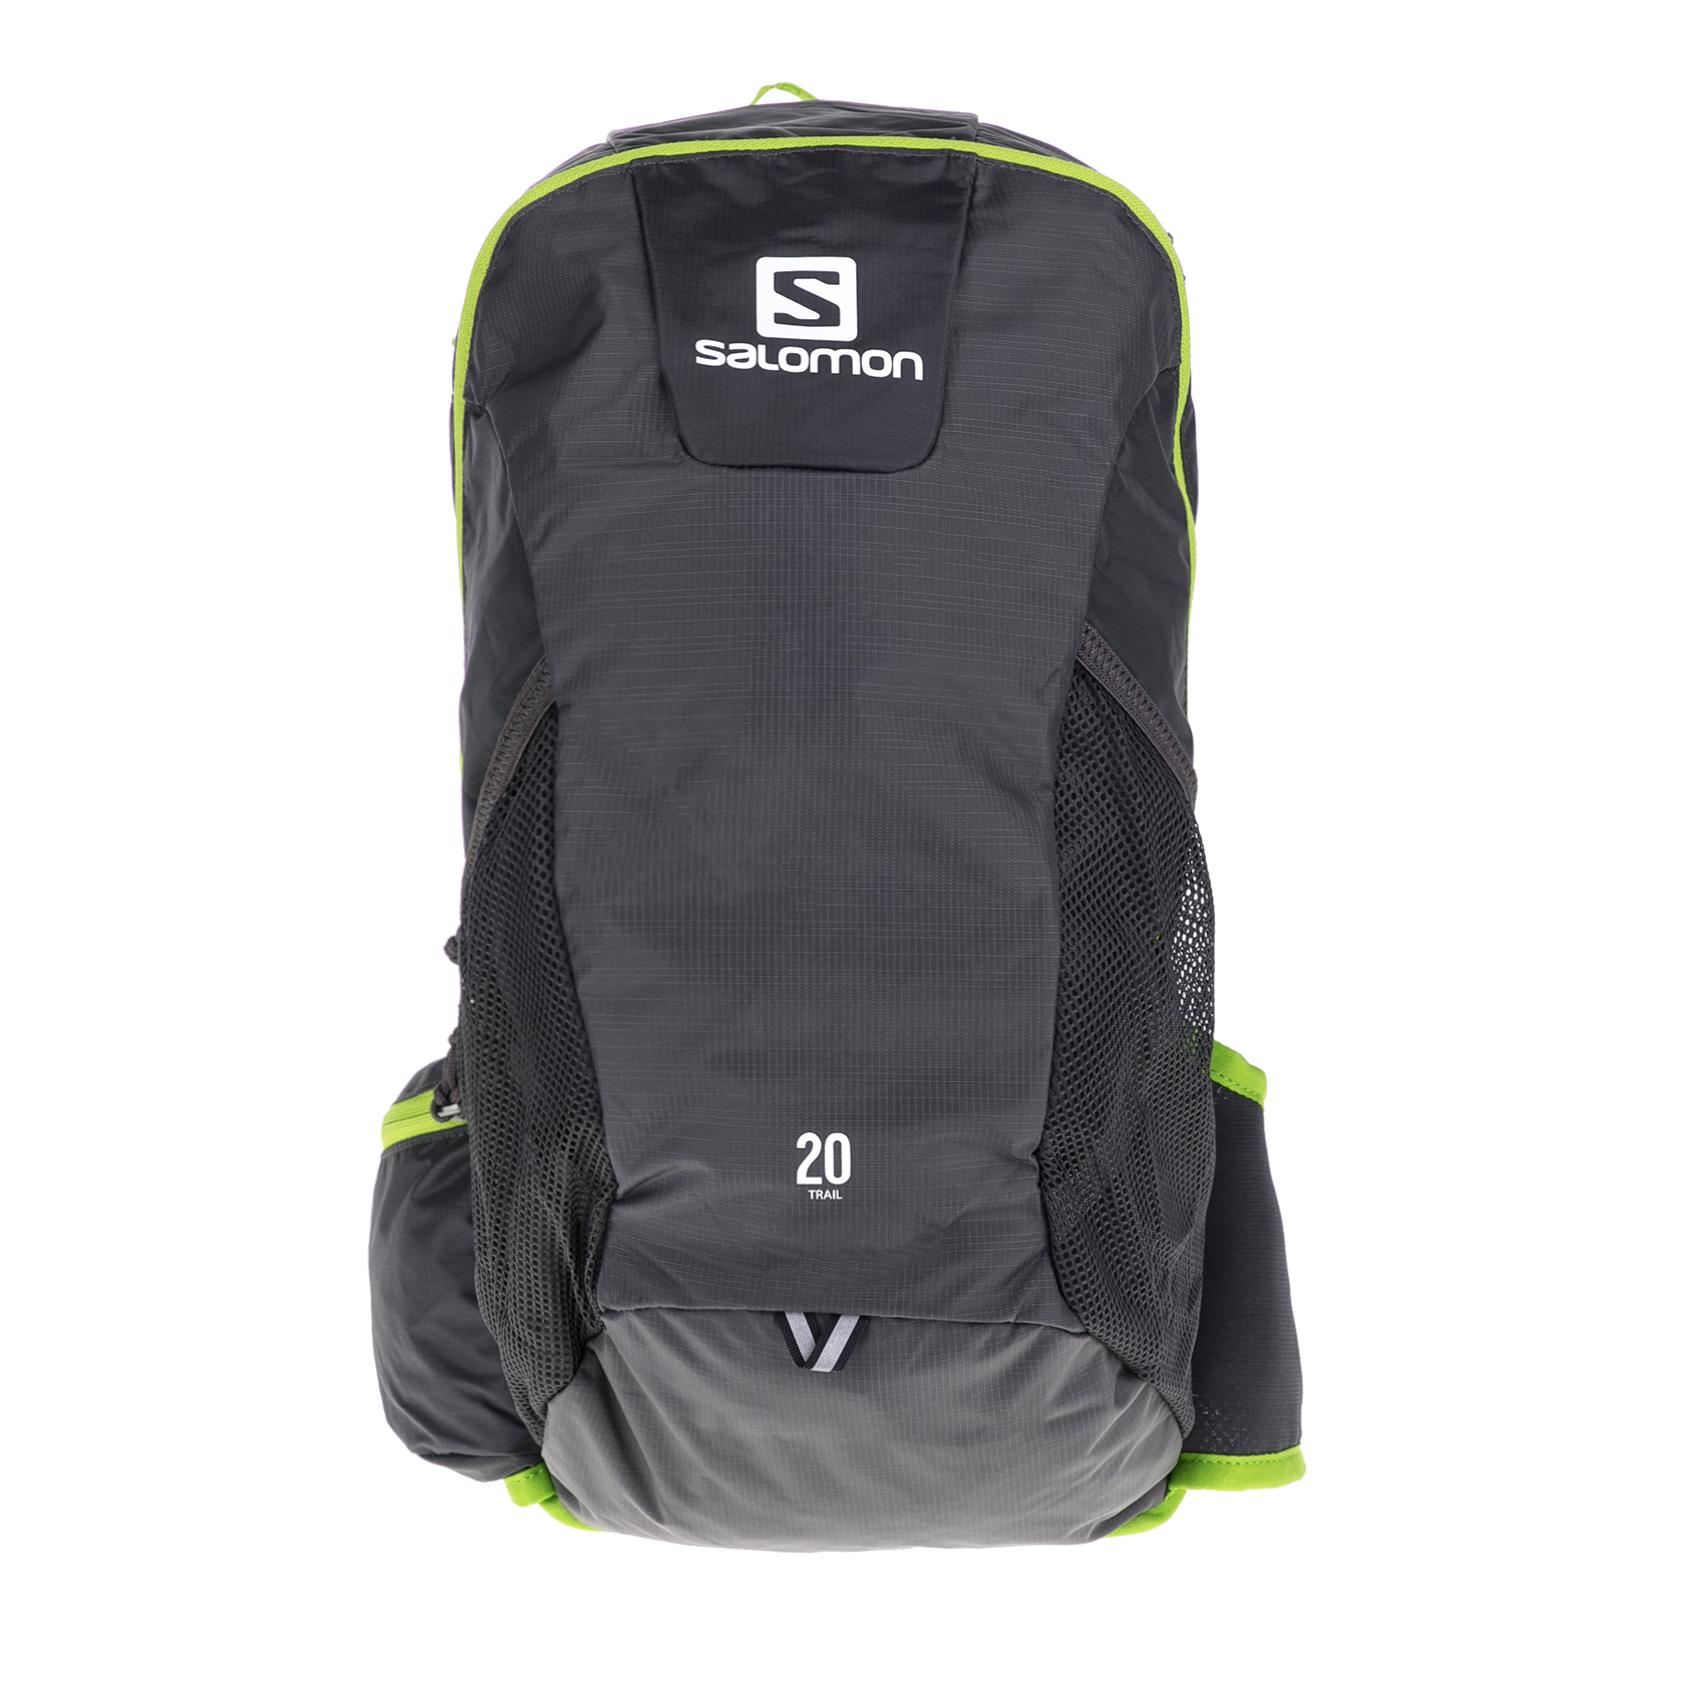 SALOMON – Σακίδιο πλάτης SALOMON PACKS BAG TRAIL 20 B γκρι-πράσινο